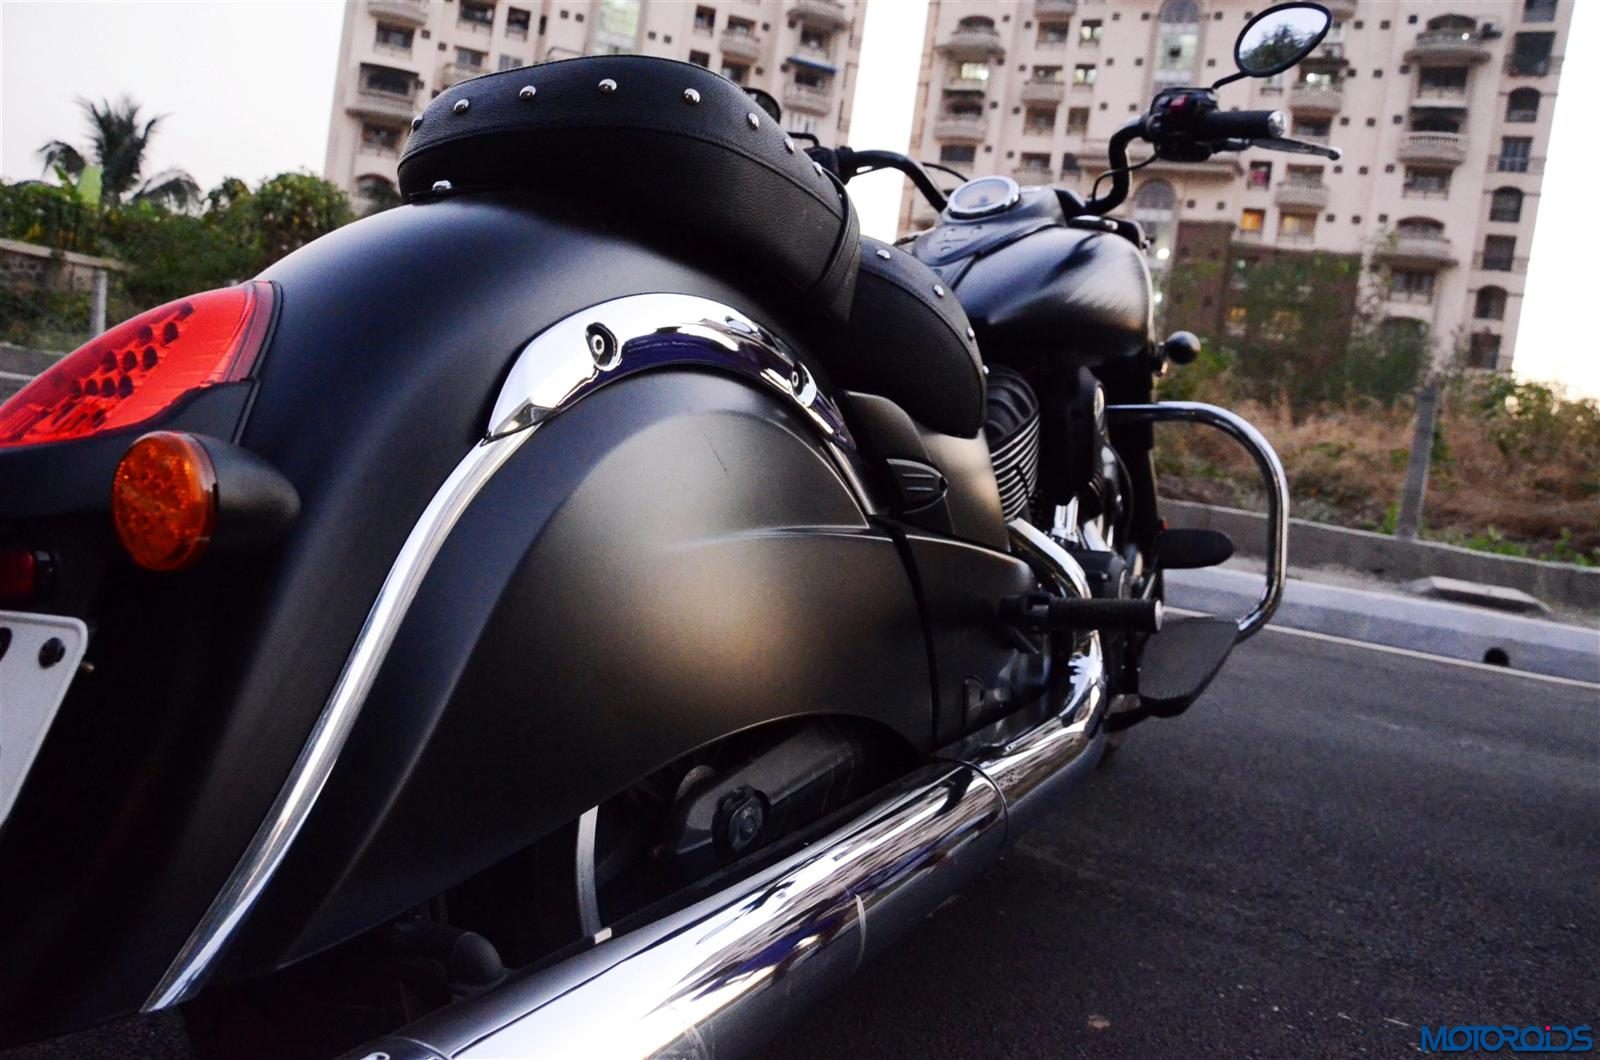 Indian Dark Horse rear view